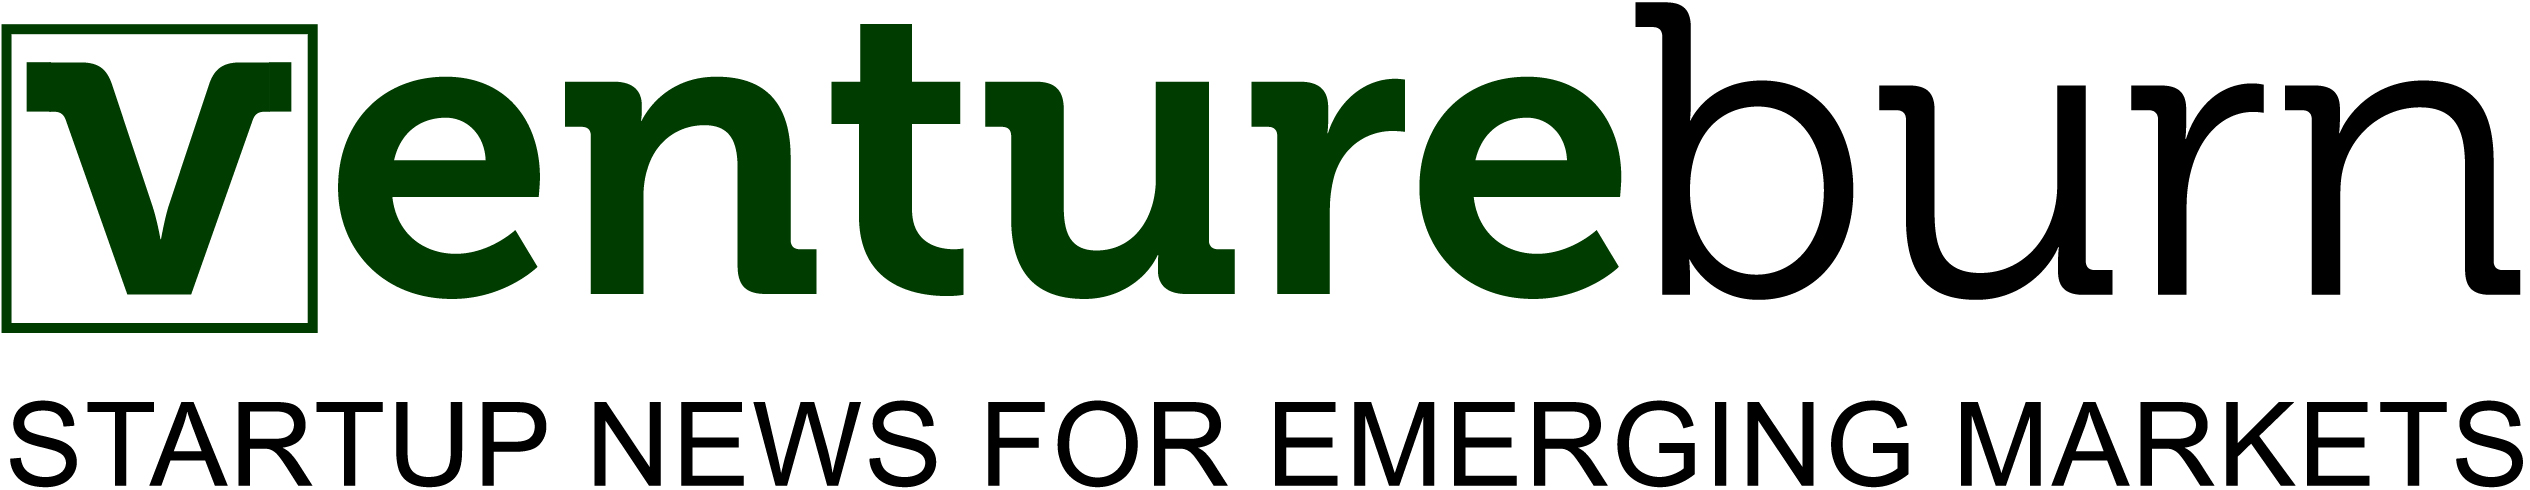 venture burn logo